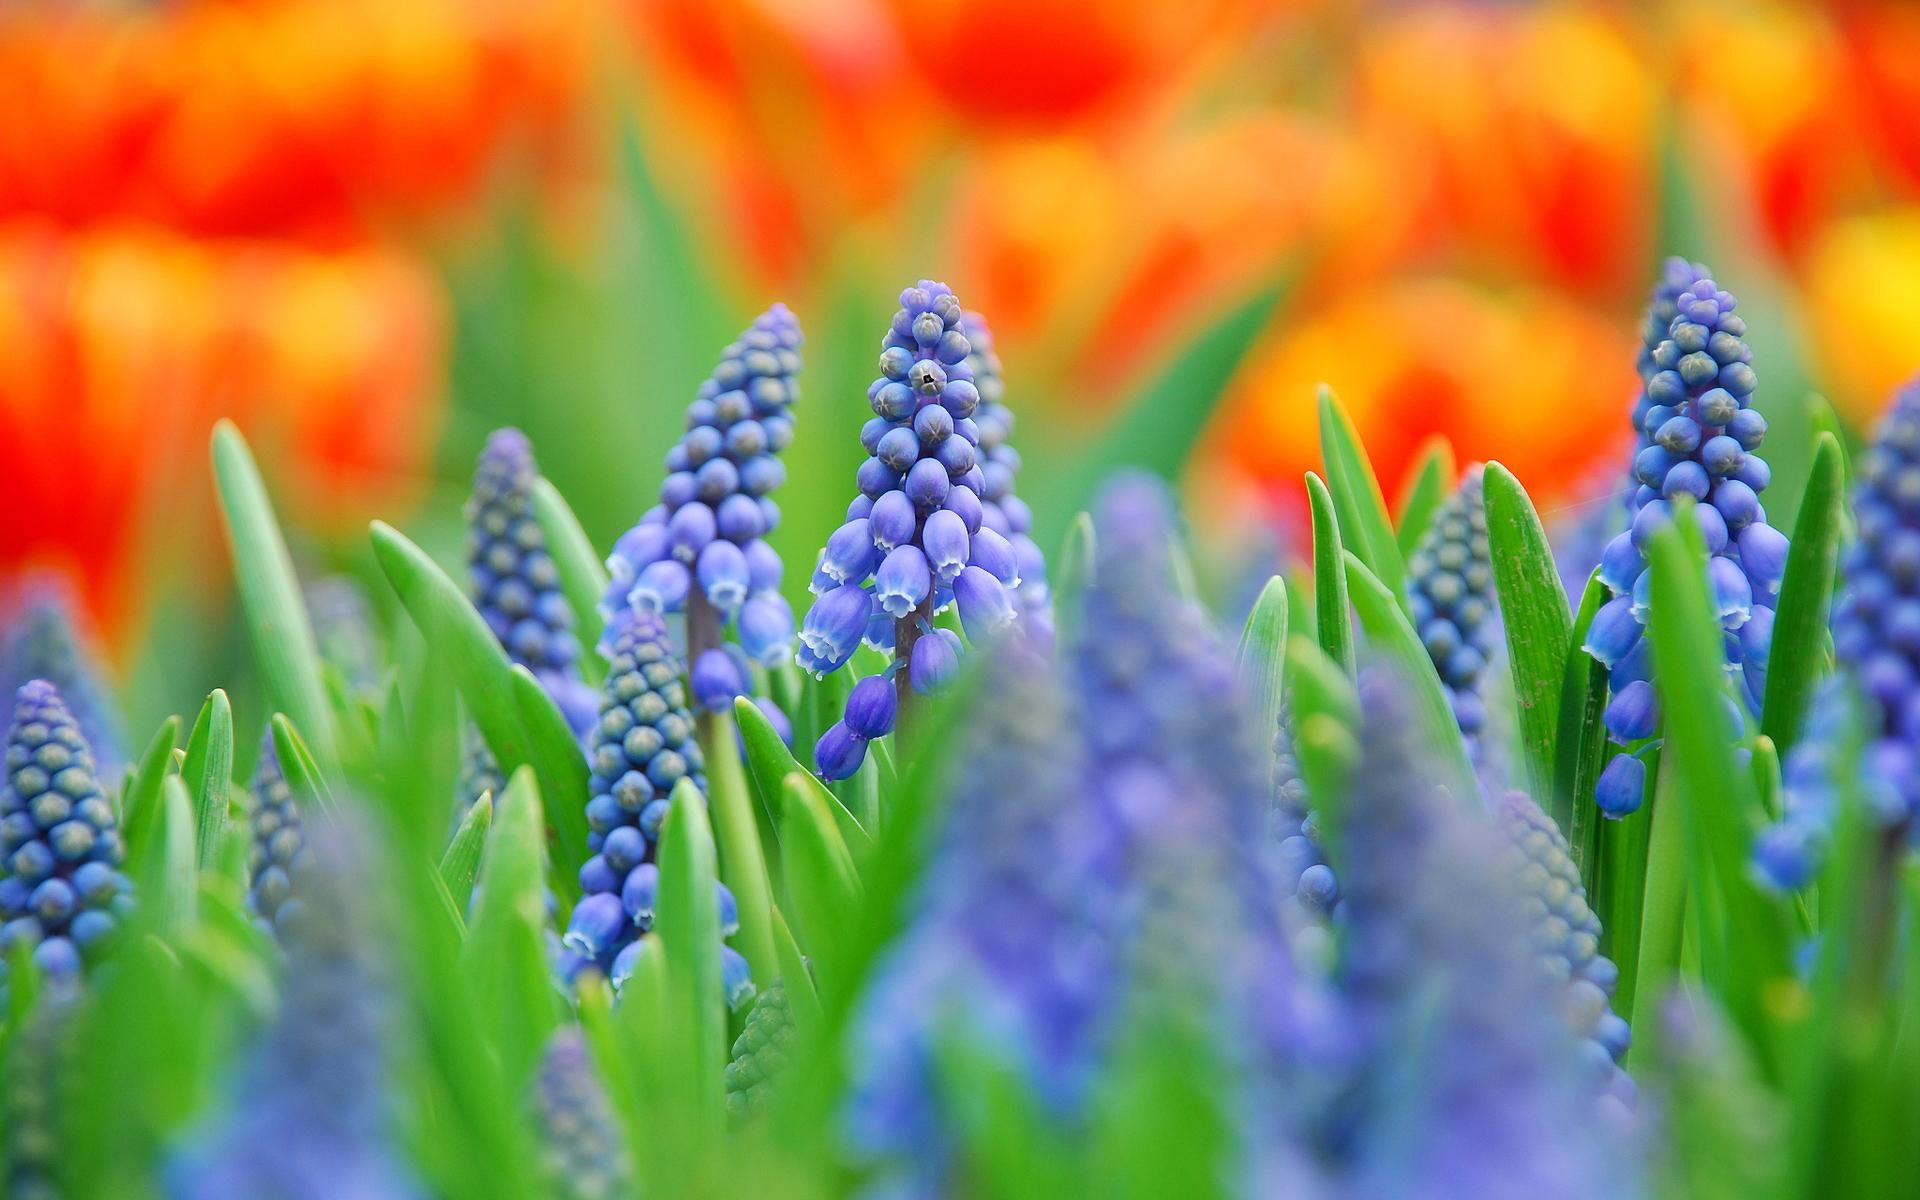 Muscari flower